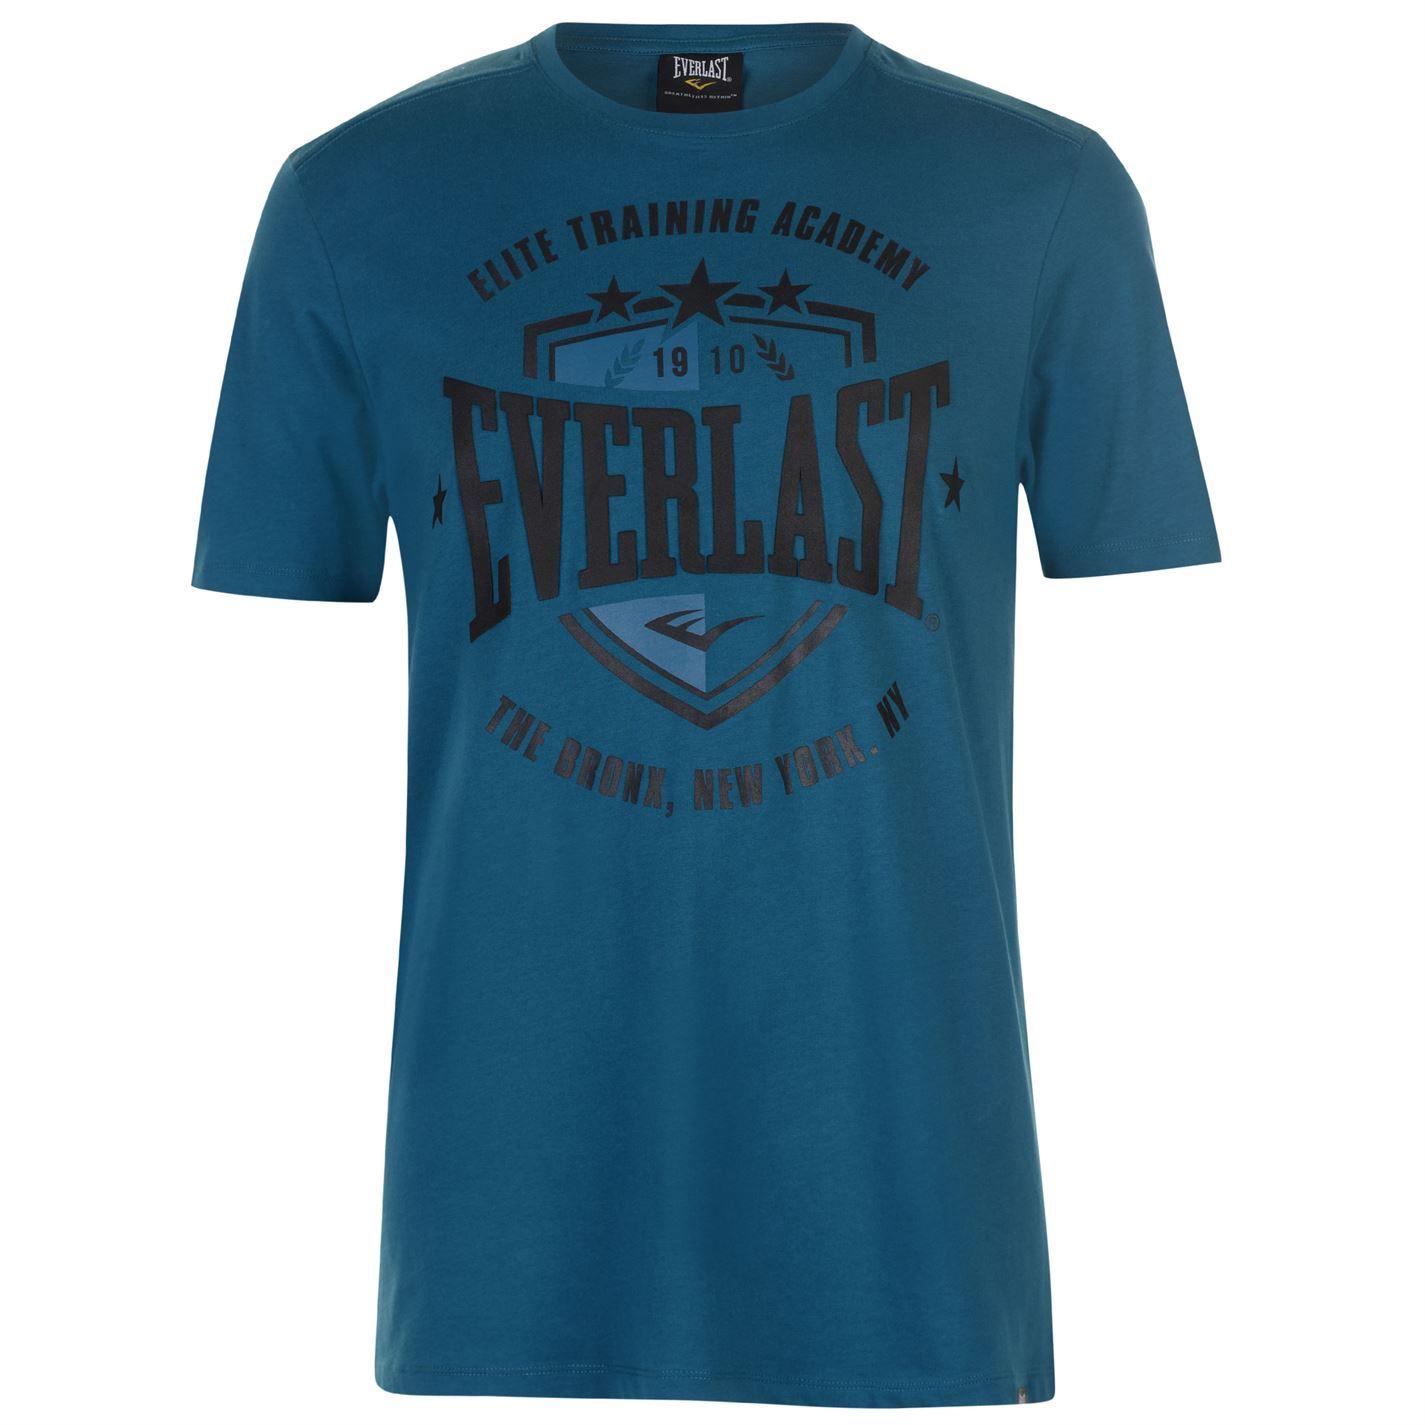 Everlast Mens Shield T Shirt Crew Neck Tee Top Short Sleeve Cotton Regular Fit